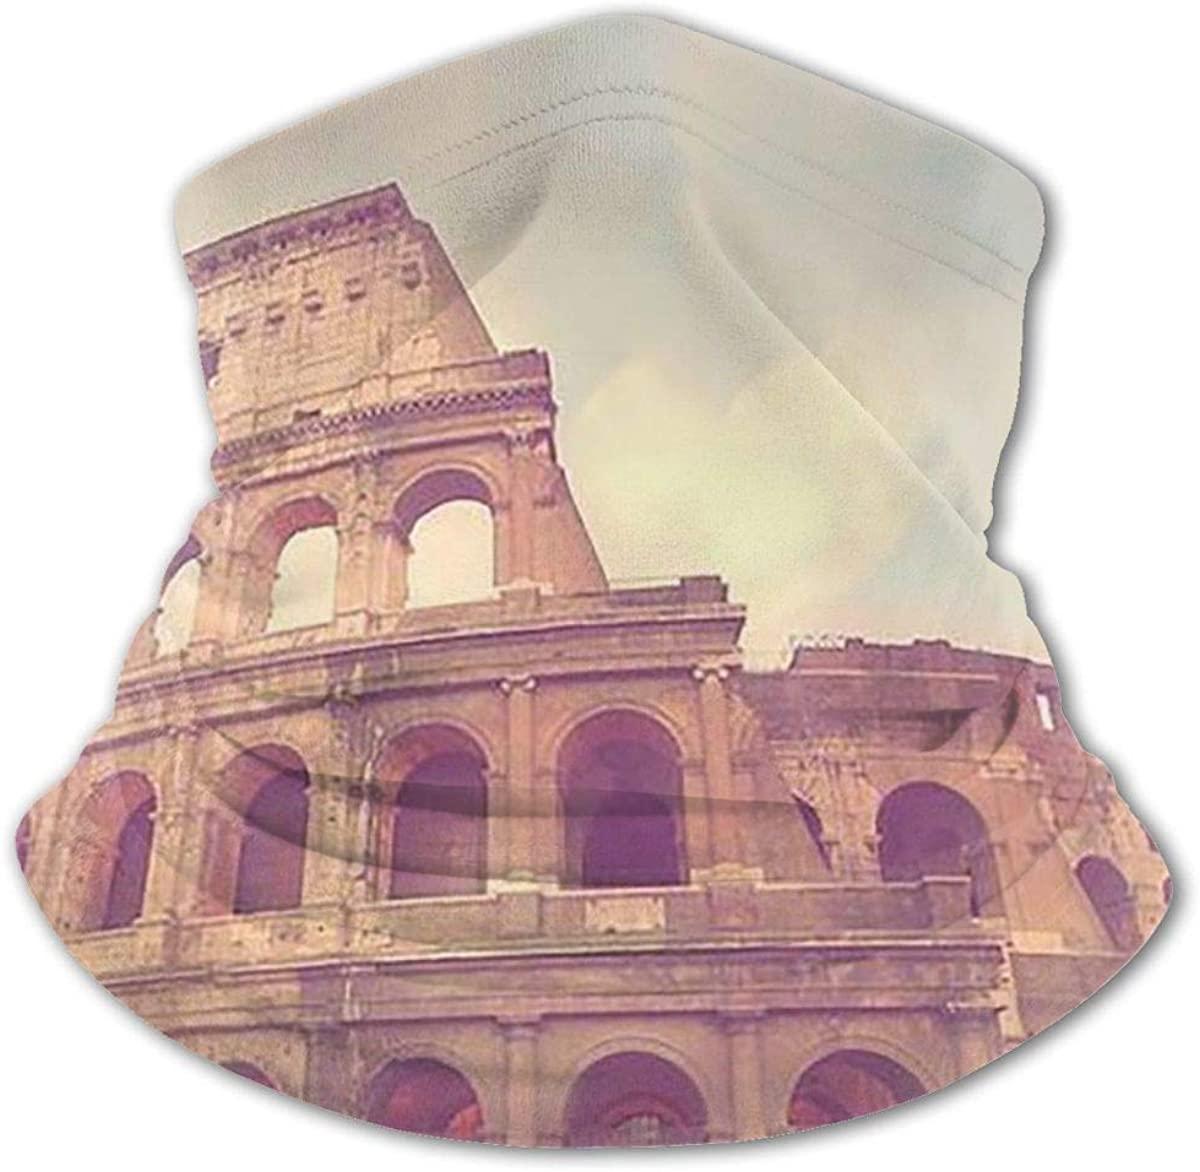 Roman Colosseum Headwear For Girls And Boys, Head Wrap, Neck Gaiter, Headband, Tenn Fishing Mask, Magic Scarf, Tube Mask, Face Bandana Mask For Camping Running Cycling